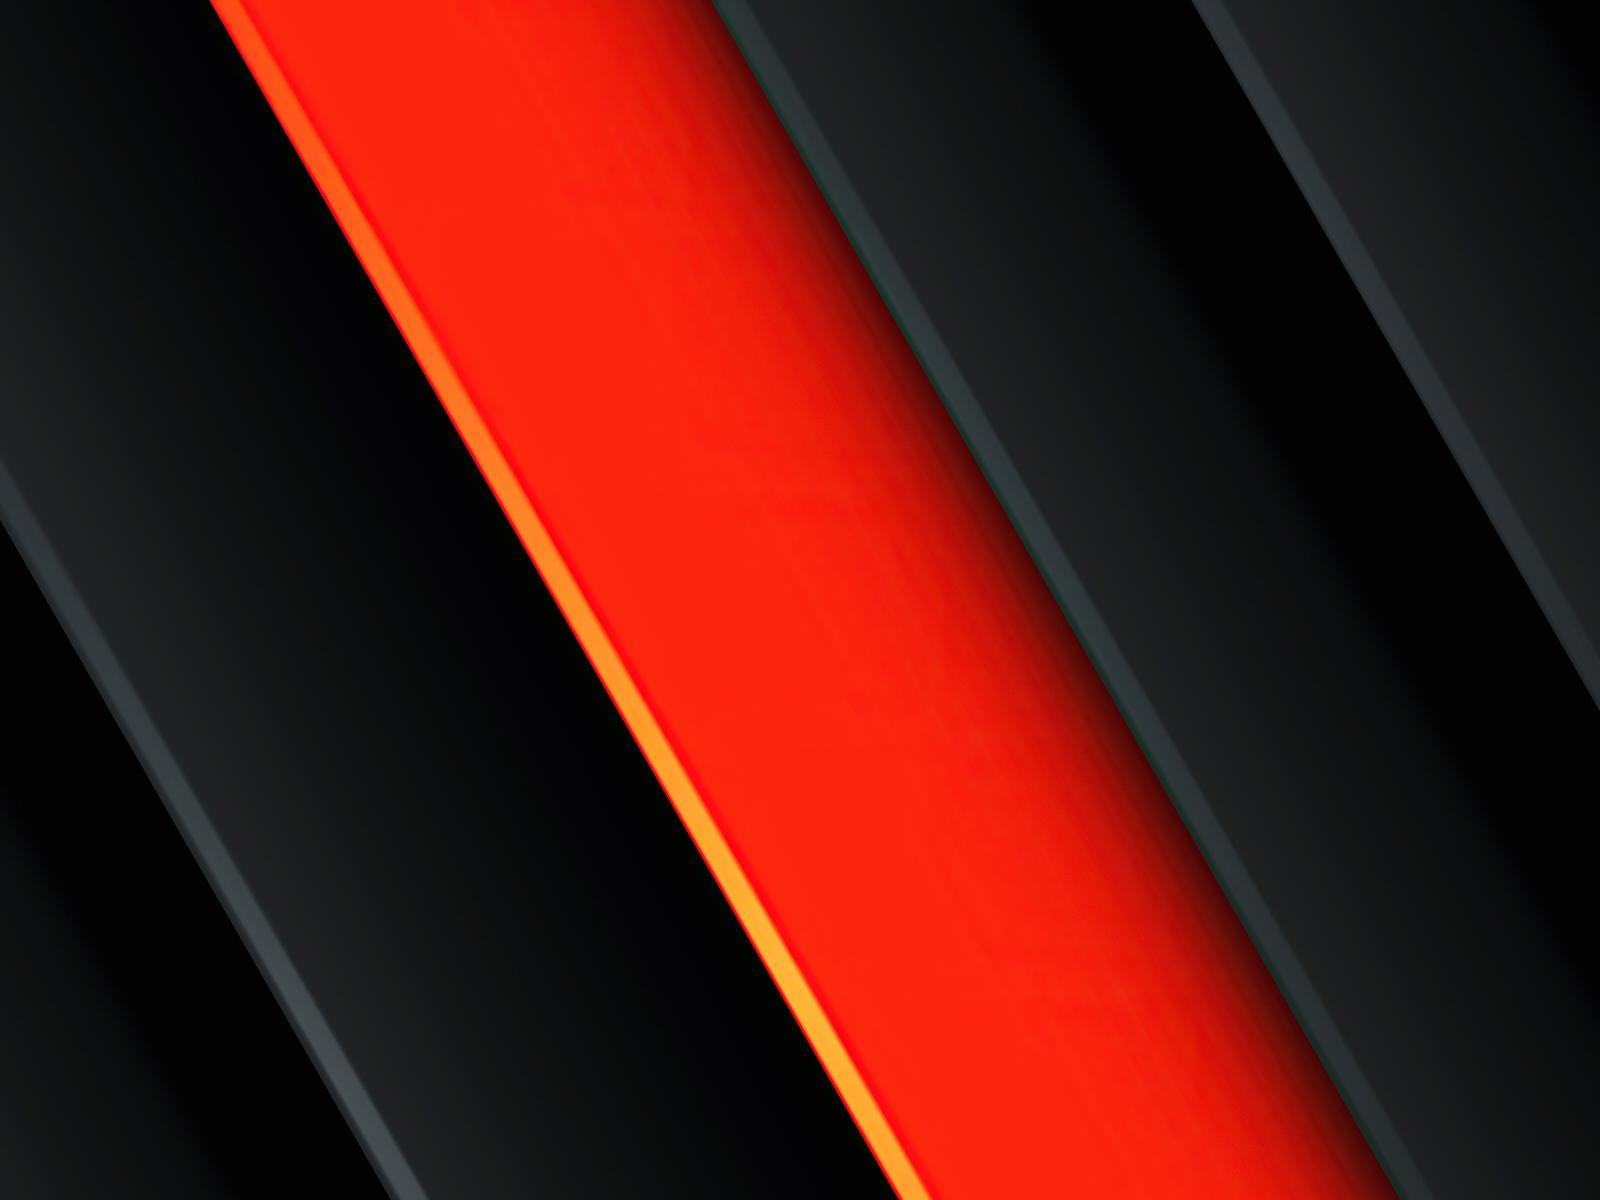 orange-red-black-abstract-5k-vs.jpg